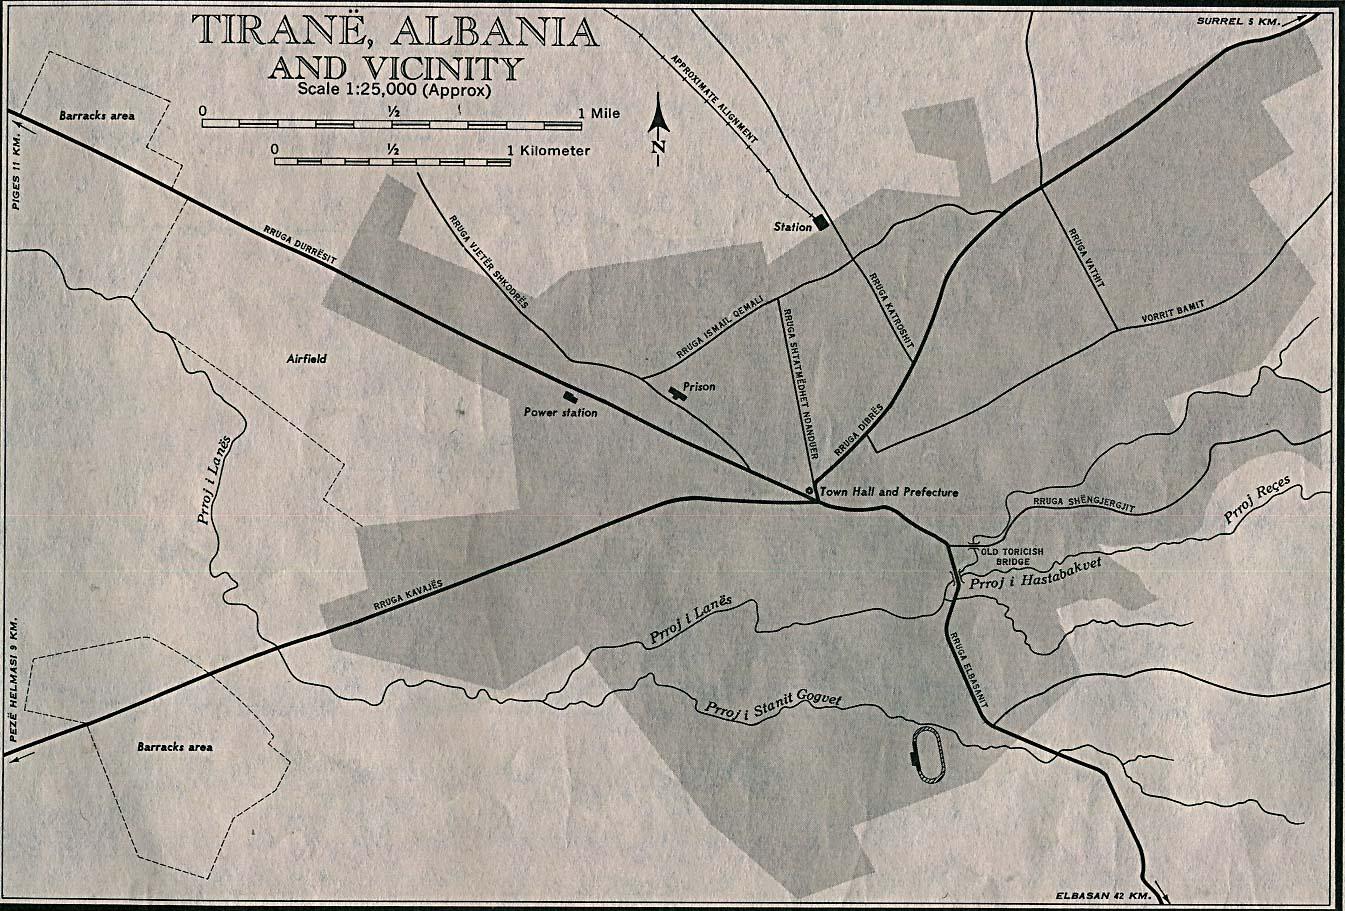 Mapa Croquis de Tirana, Albania